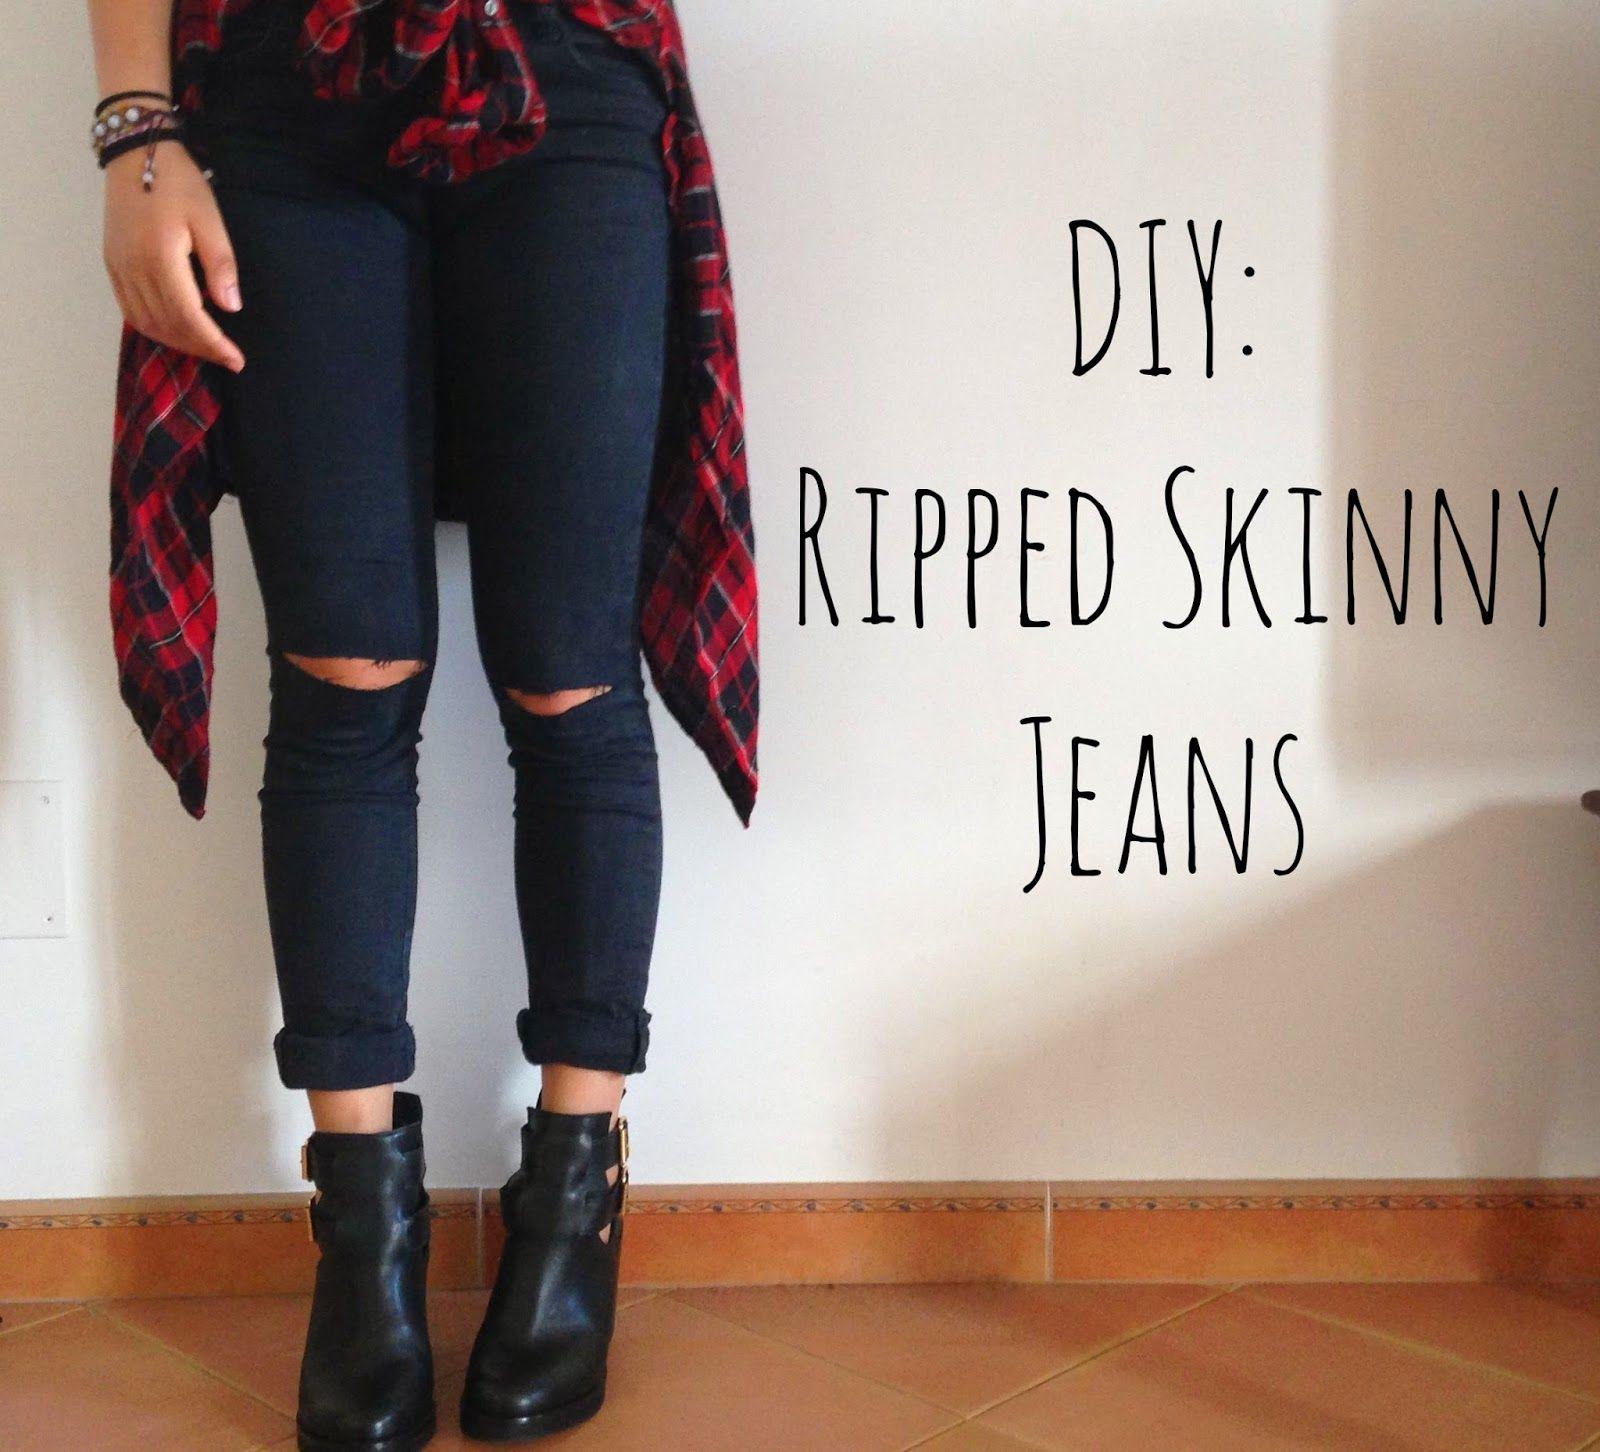 DIY Ripped (Knee) Skinny Jeans | Gettin' Crafty | Pinterest ...